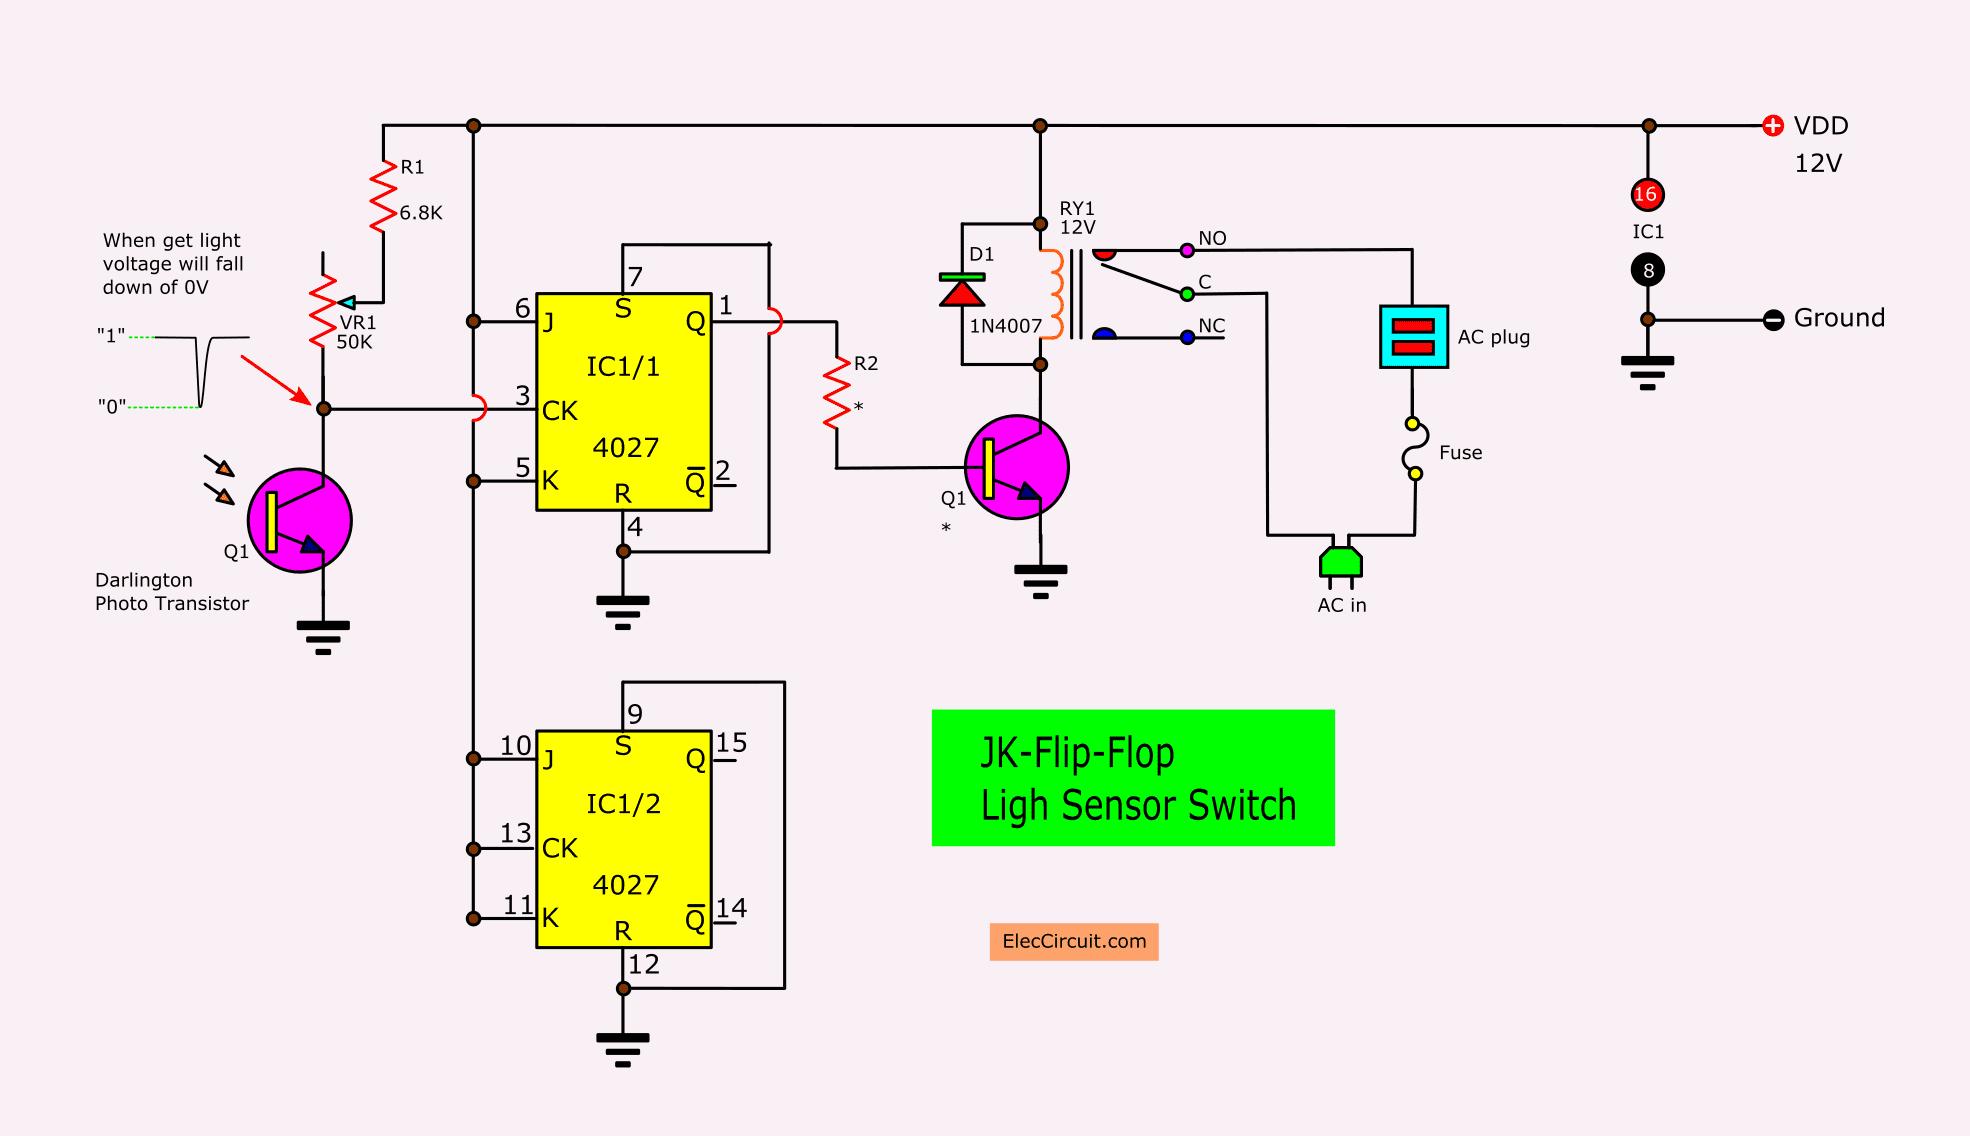 Light sensor switch circuit using JK-Flip-Flop - ElecCircuit